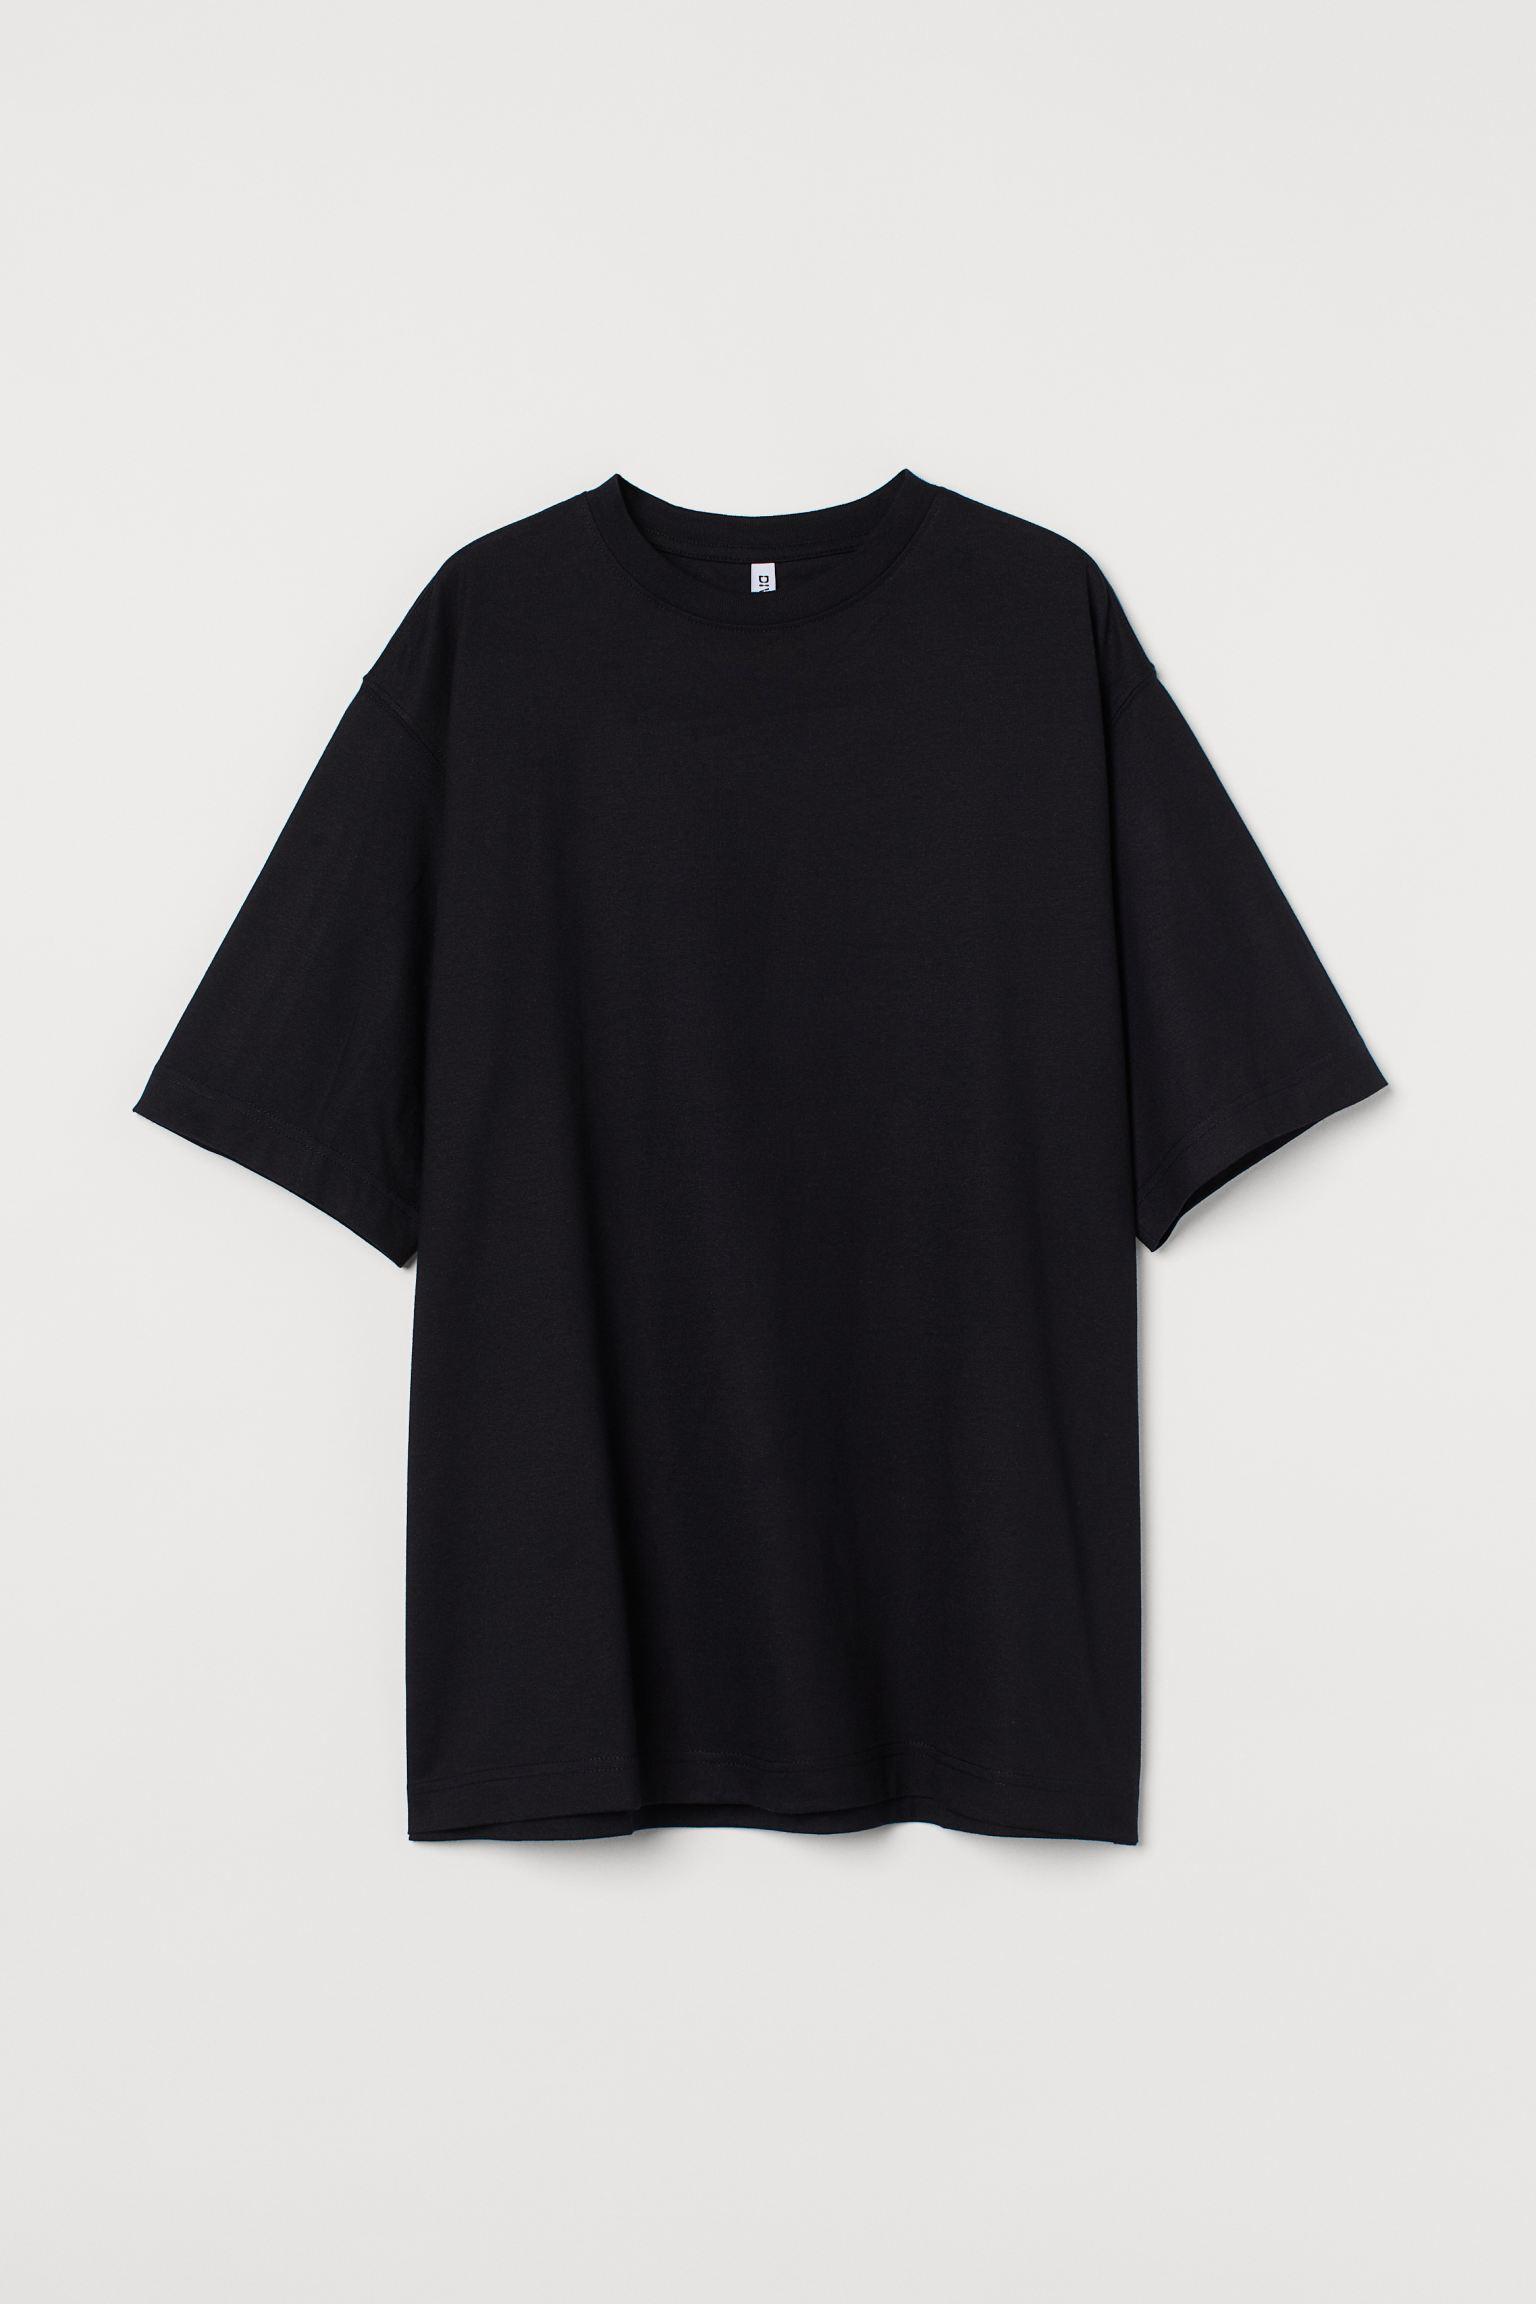 Camisa amplia negra